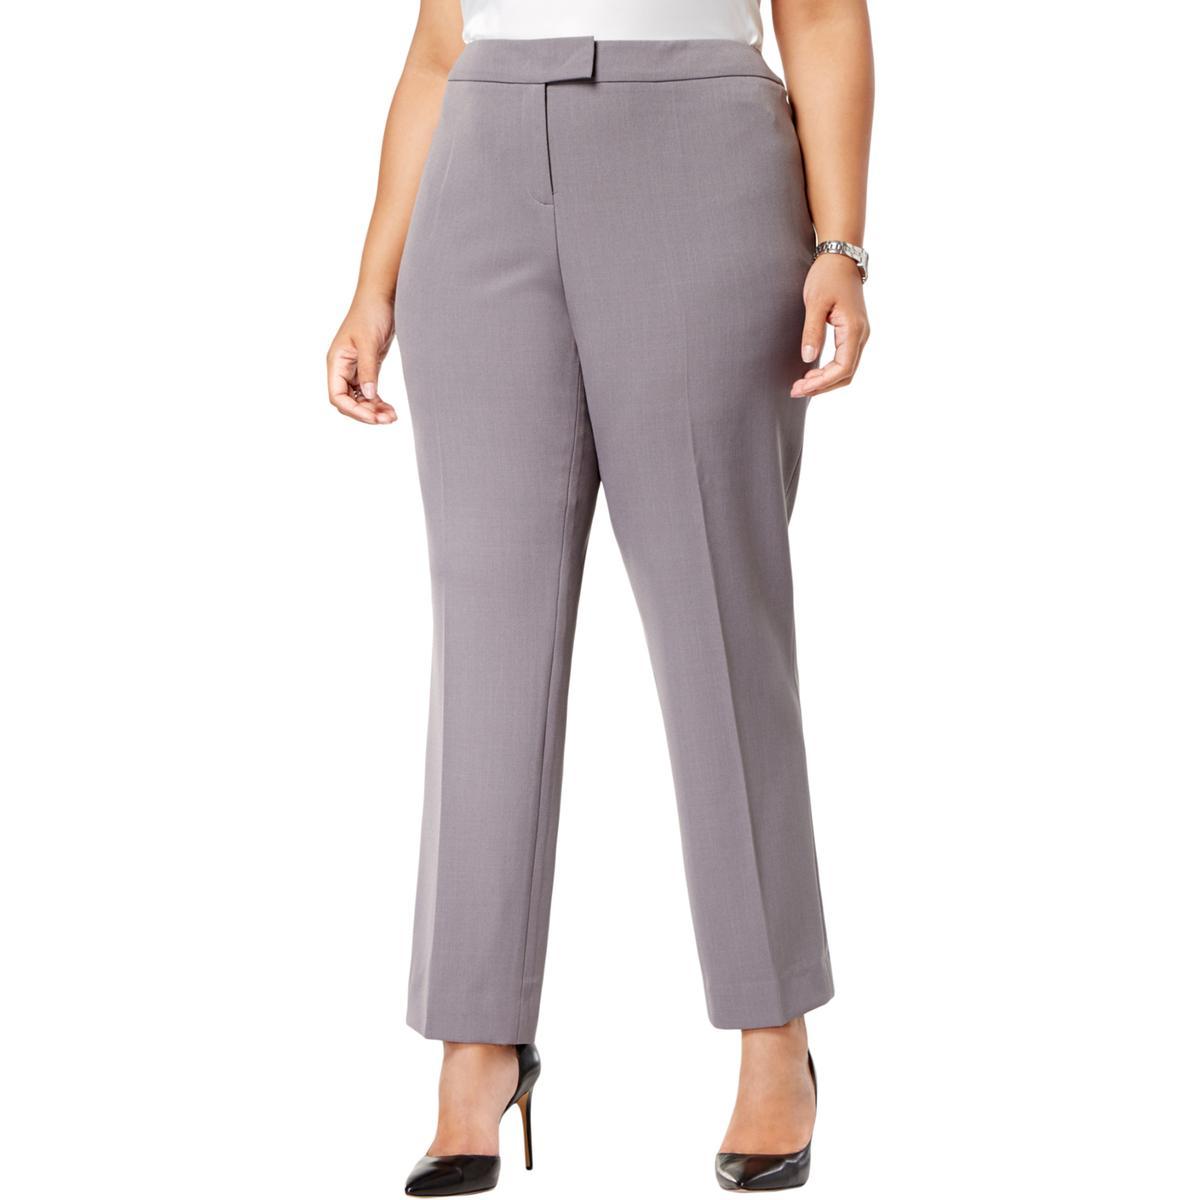 d497b6cc8a55d Anne Klein Plus Womens Straight Leg Professional Dress Pants